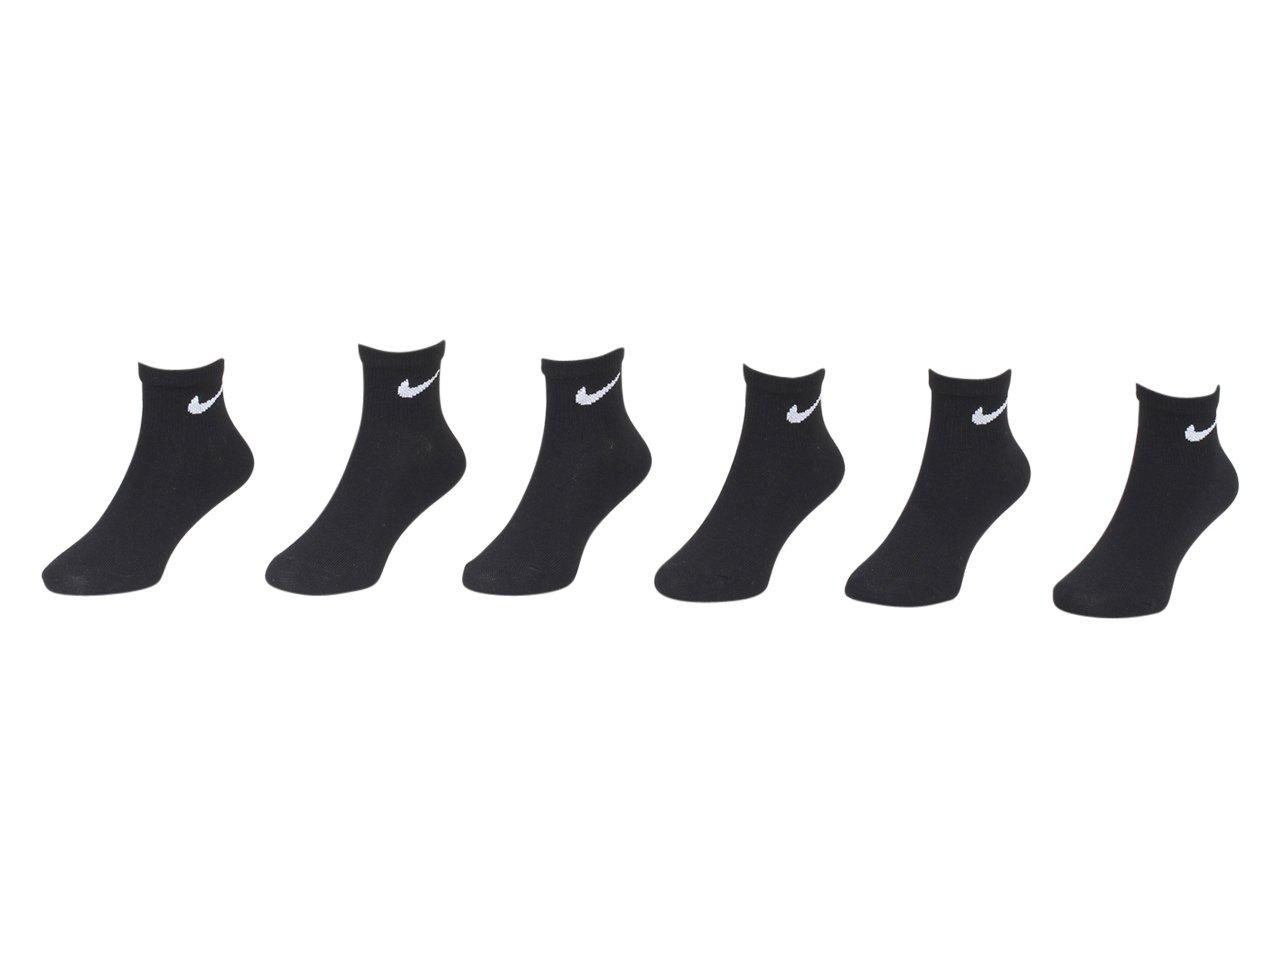 6 Pairs ,13C-3Y Shoe// 6-7 Sock NIKE Young Athletes Kids Quarter Cut Socks